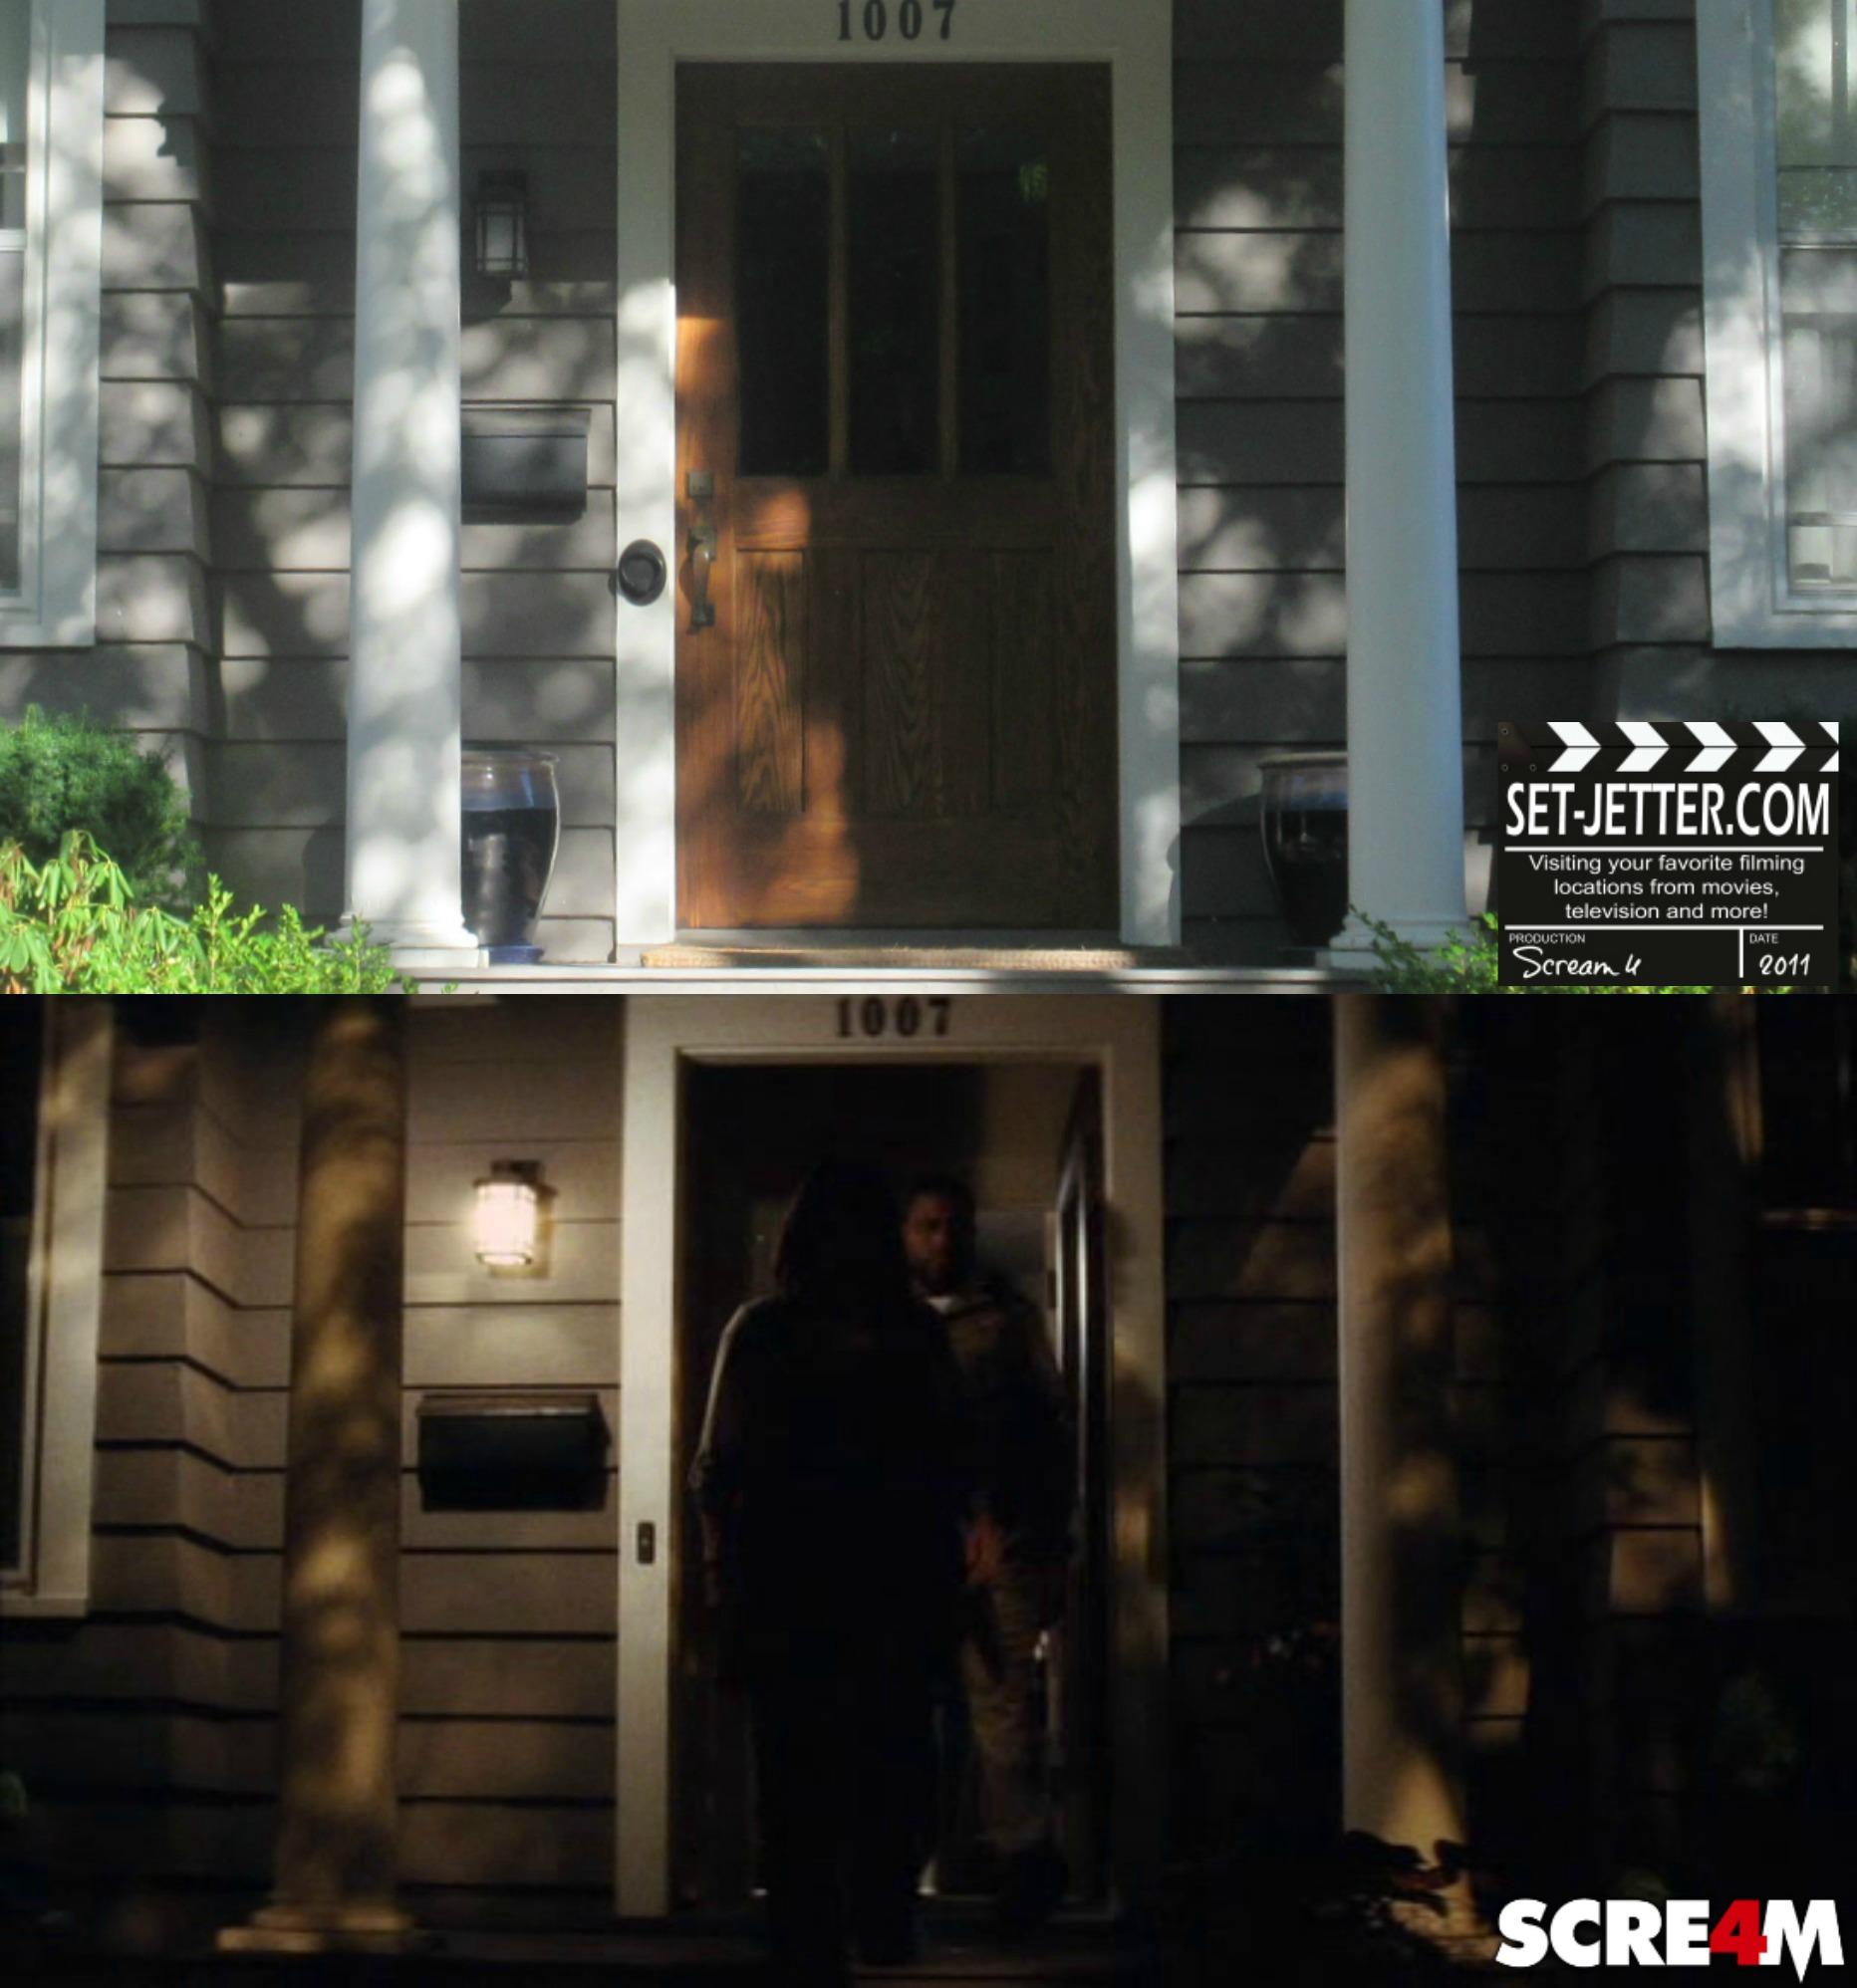 Scream4 comparison 127.jpg